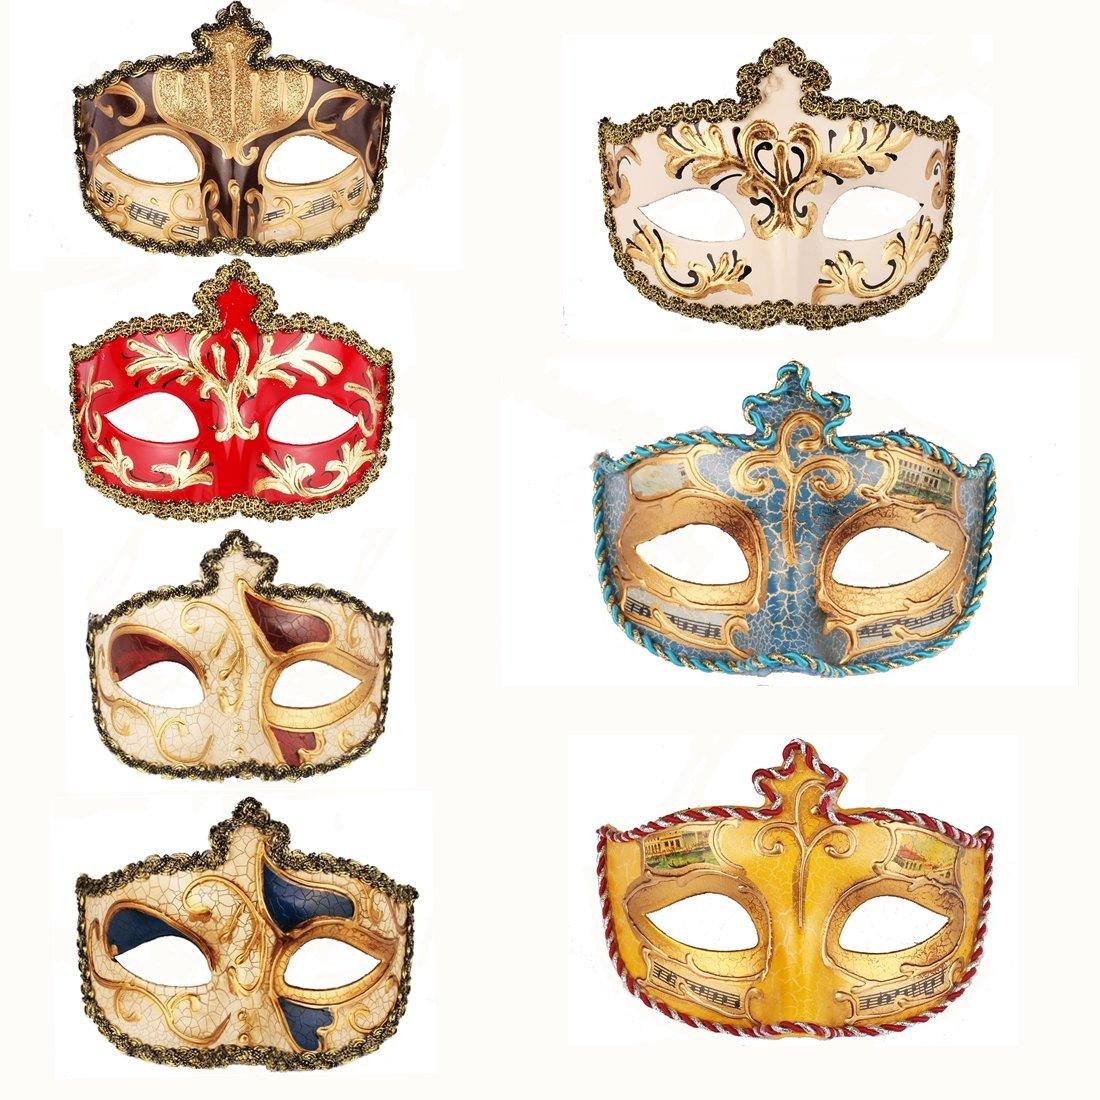 YUFENG 12pcs Set Evening Prom Venetian Masquerade Masks Costumes Party Accessory